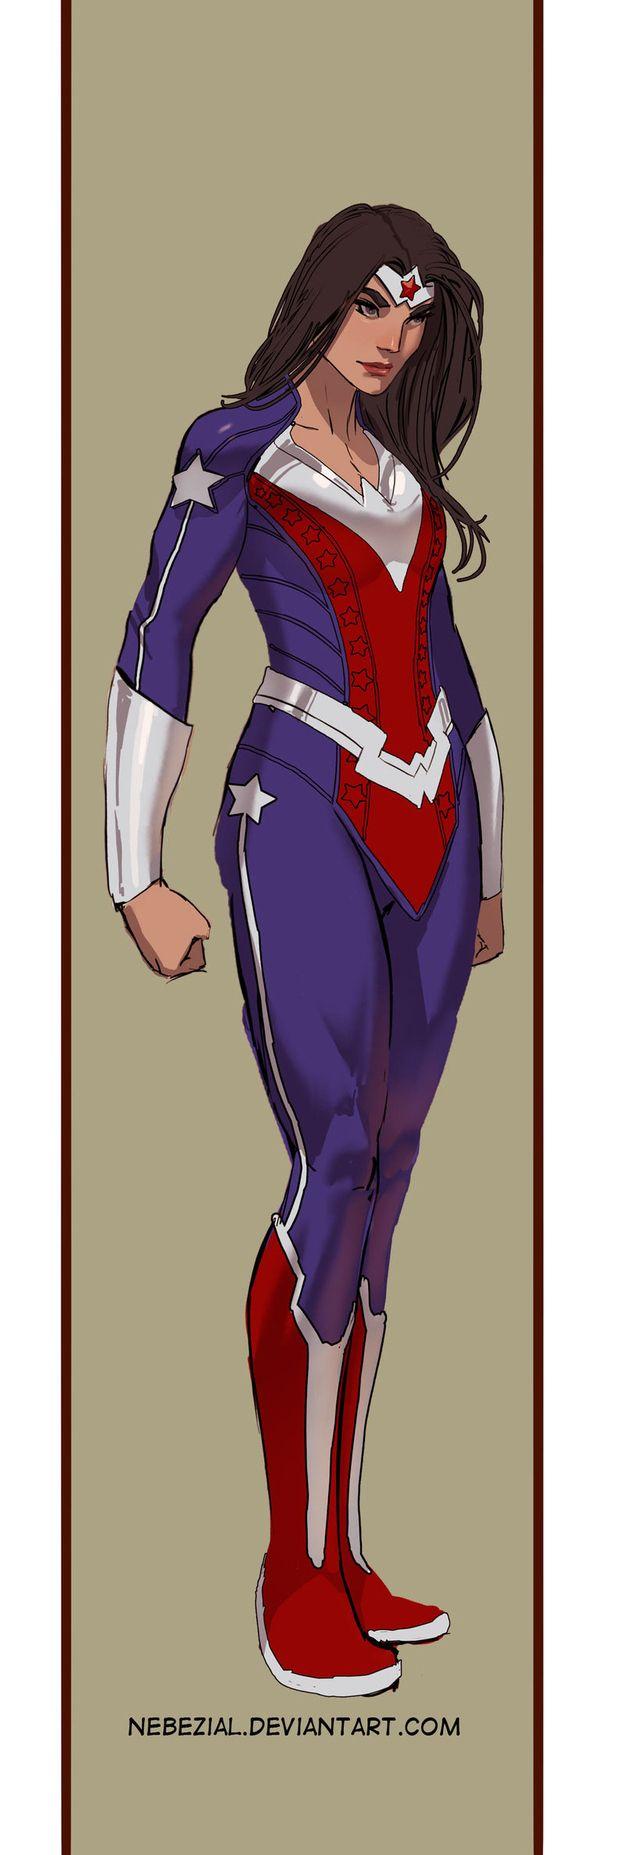 The 25 Best Modest Wonder Woman Costume Ideas On -8217